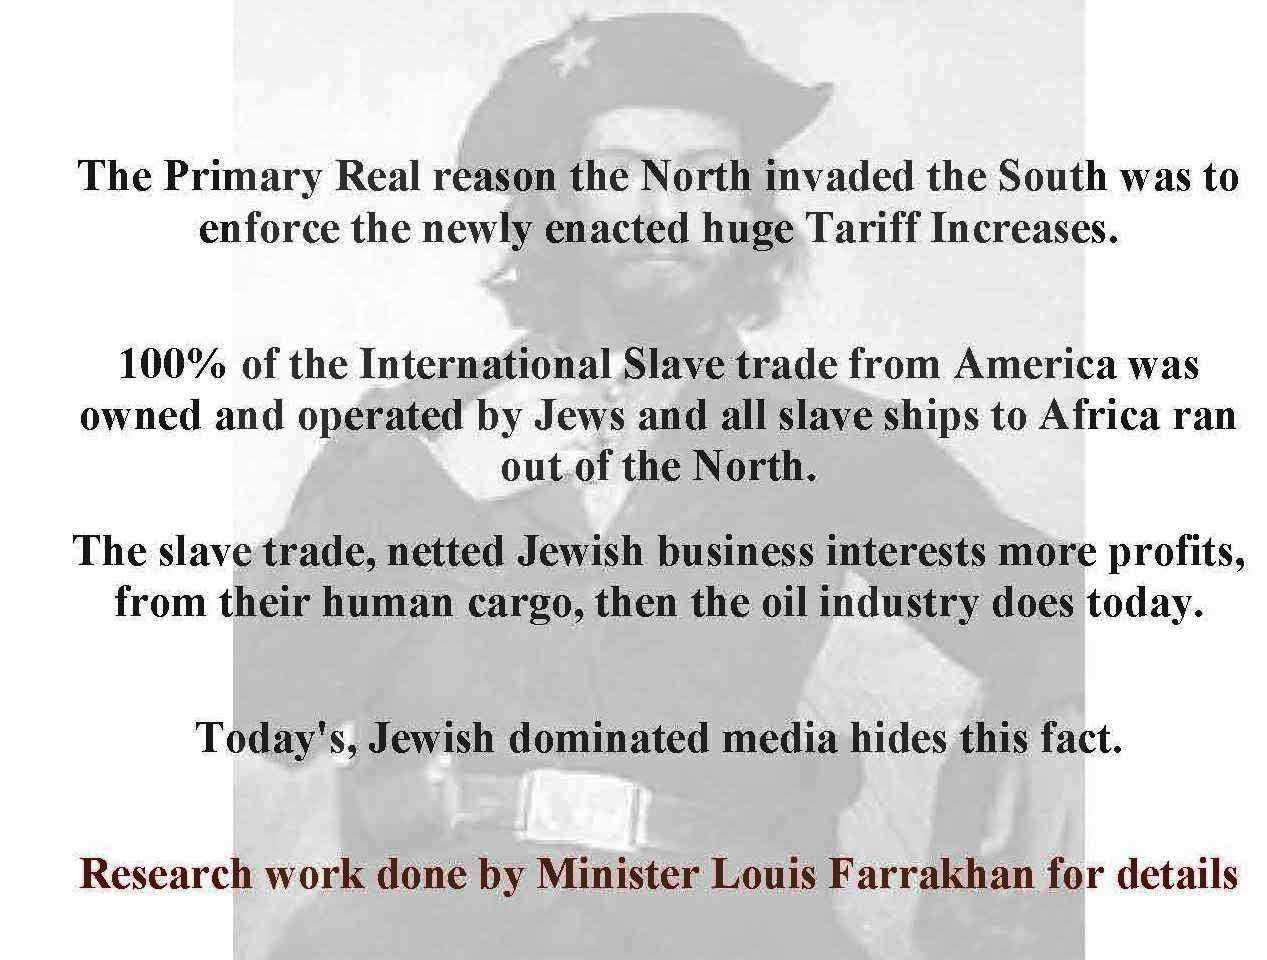 100% of the International Slave trade